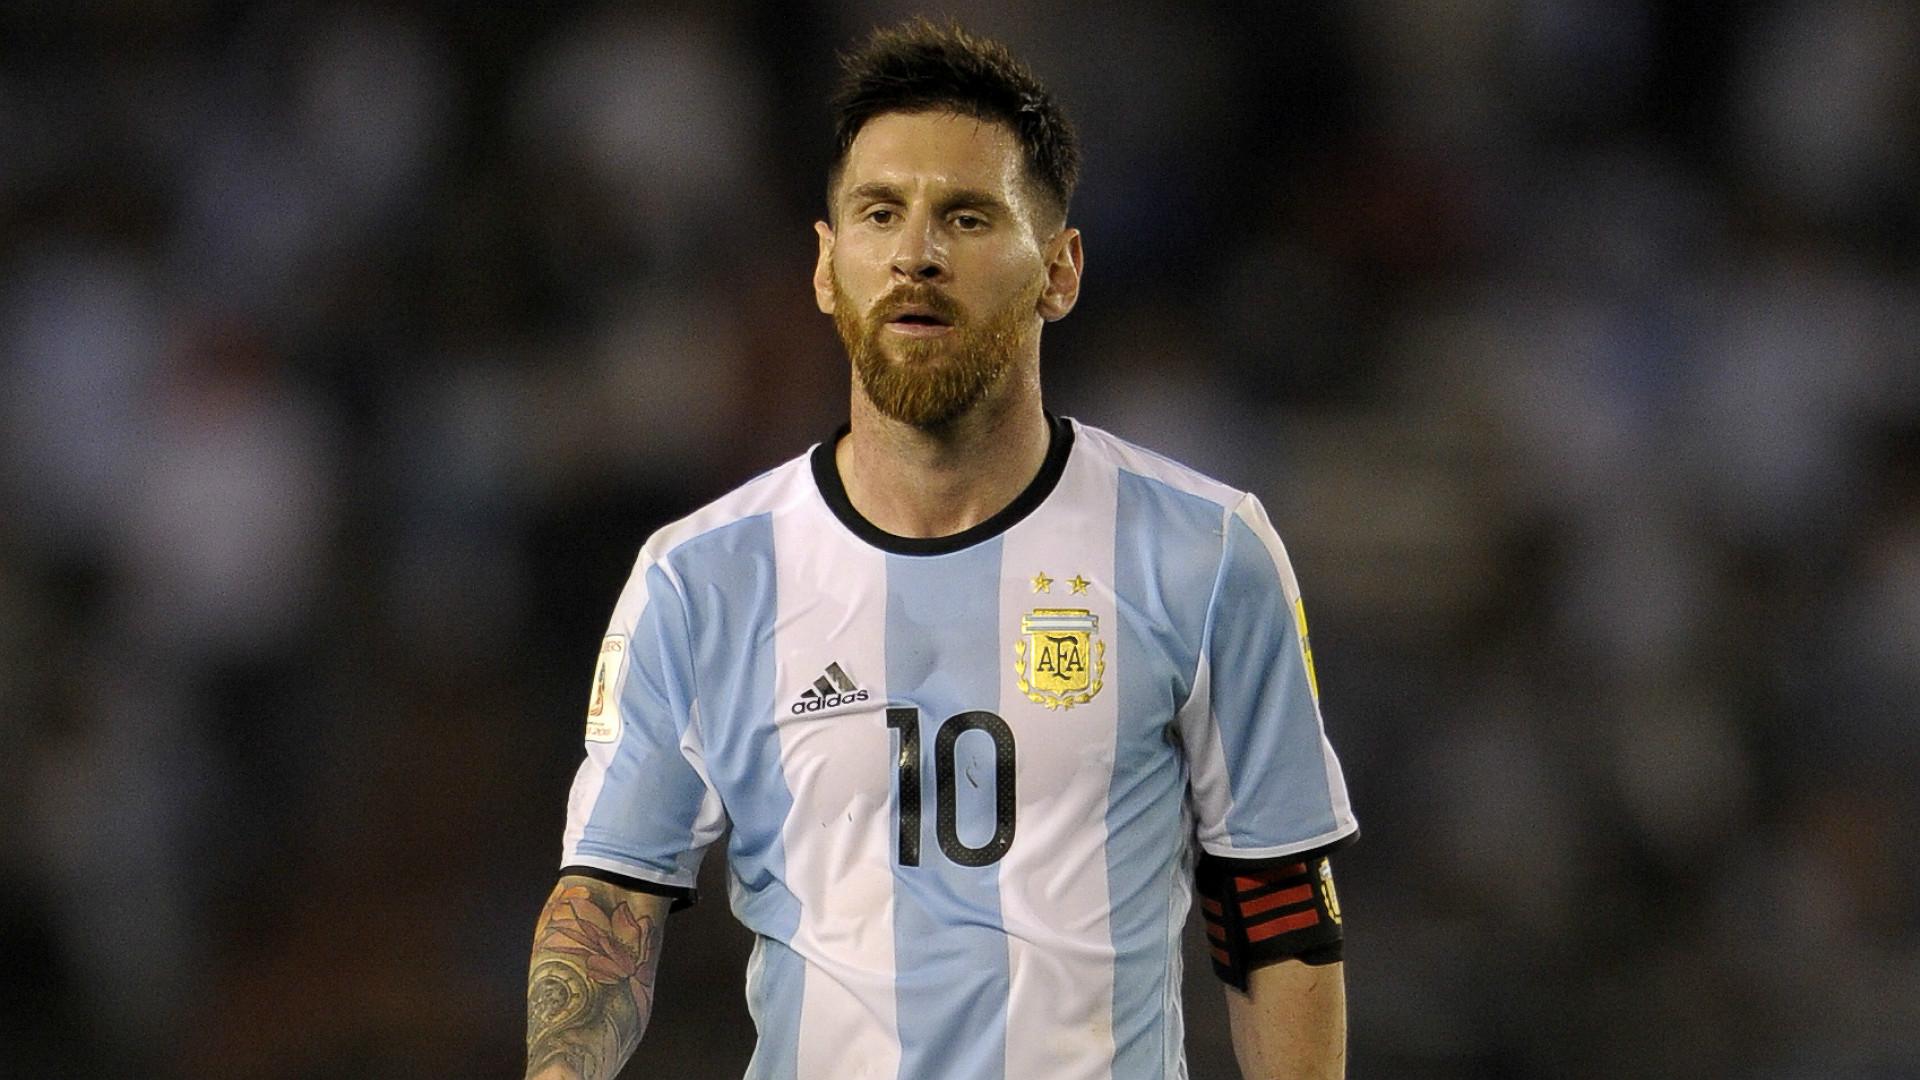 1920x1080 Amazing Lionel Messi Wallpaper Mobile FC Barcelona HD 2017 KDY5